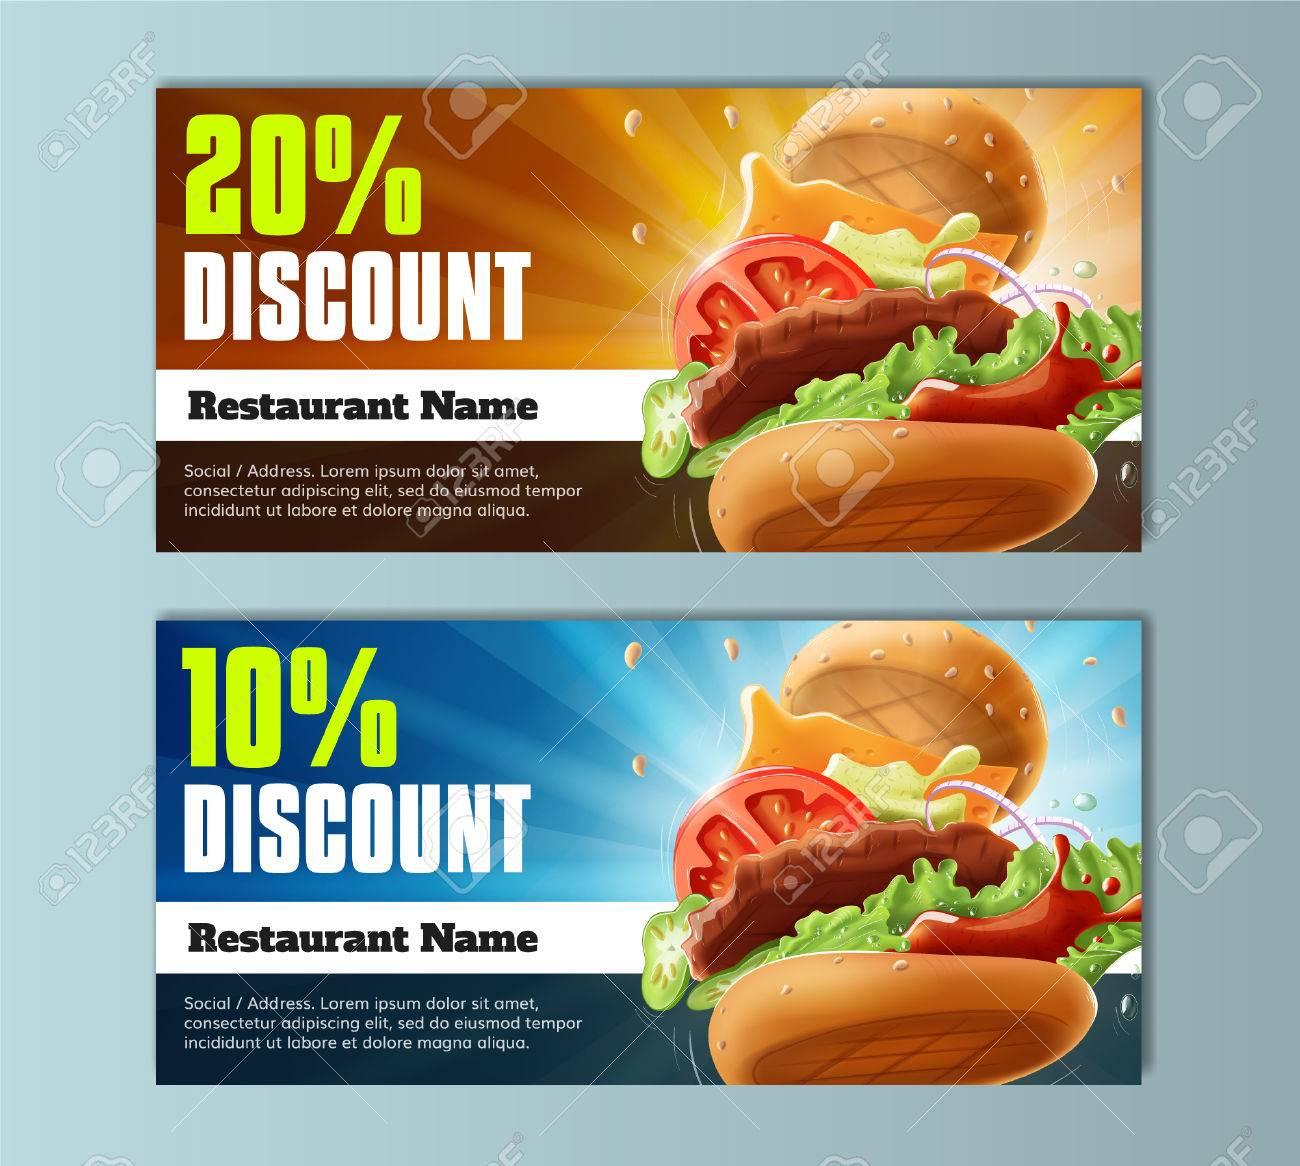 Burger Discount Voucher Template Stock Vector   80178513